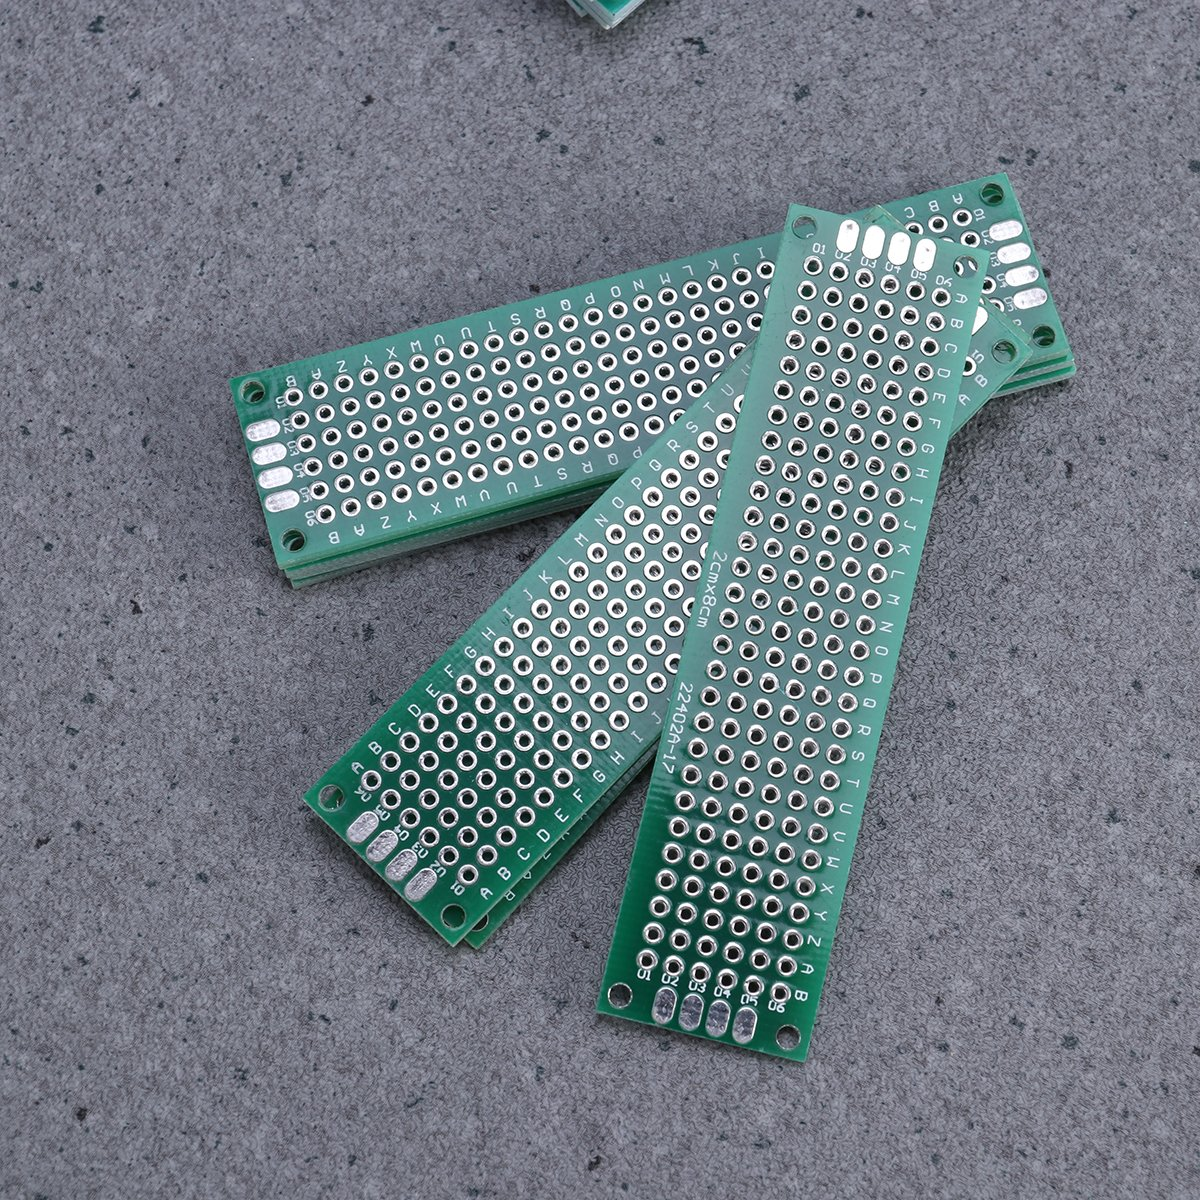 UEETEK 32pcs doble cara PCB Board Prototype Kit para soldar DIY con 5 tama/ños